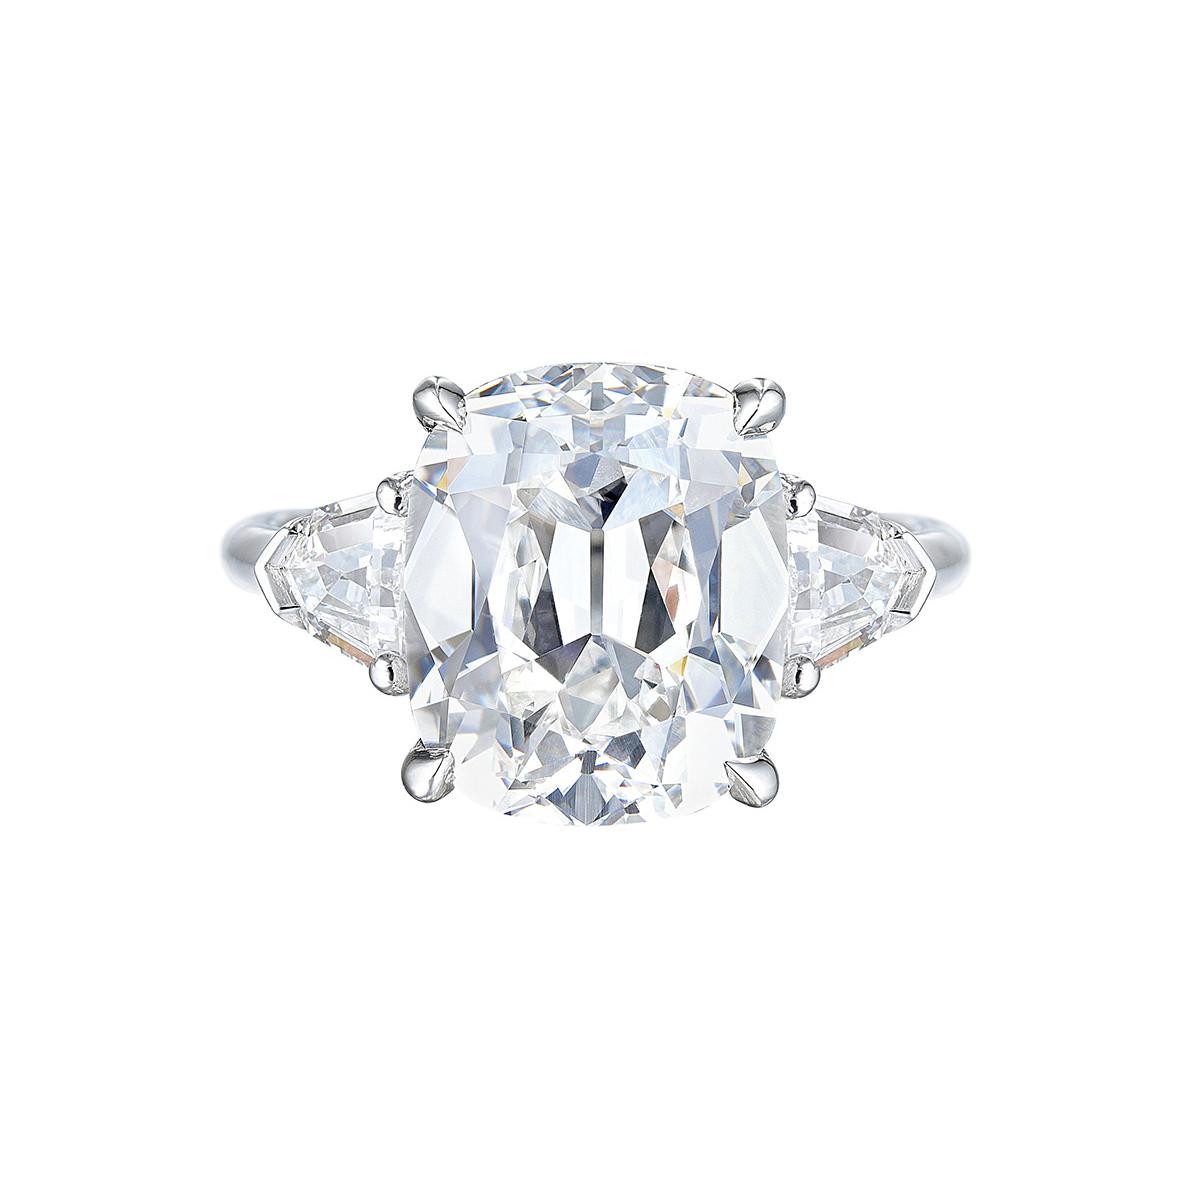 Harry Winston Diamond Ring With Winston Blossom Diamond Engagement Rings (View 9 of 25)